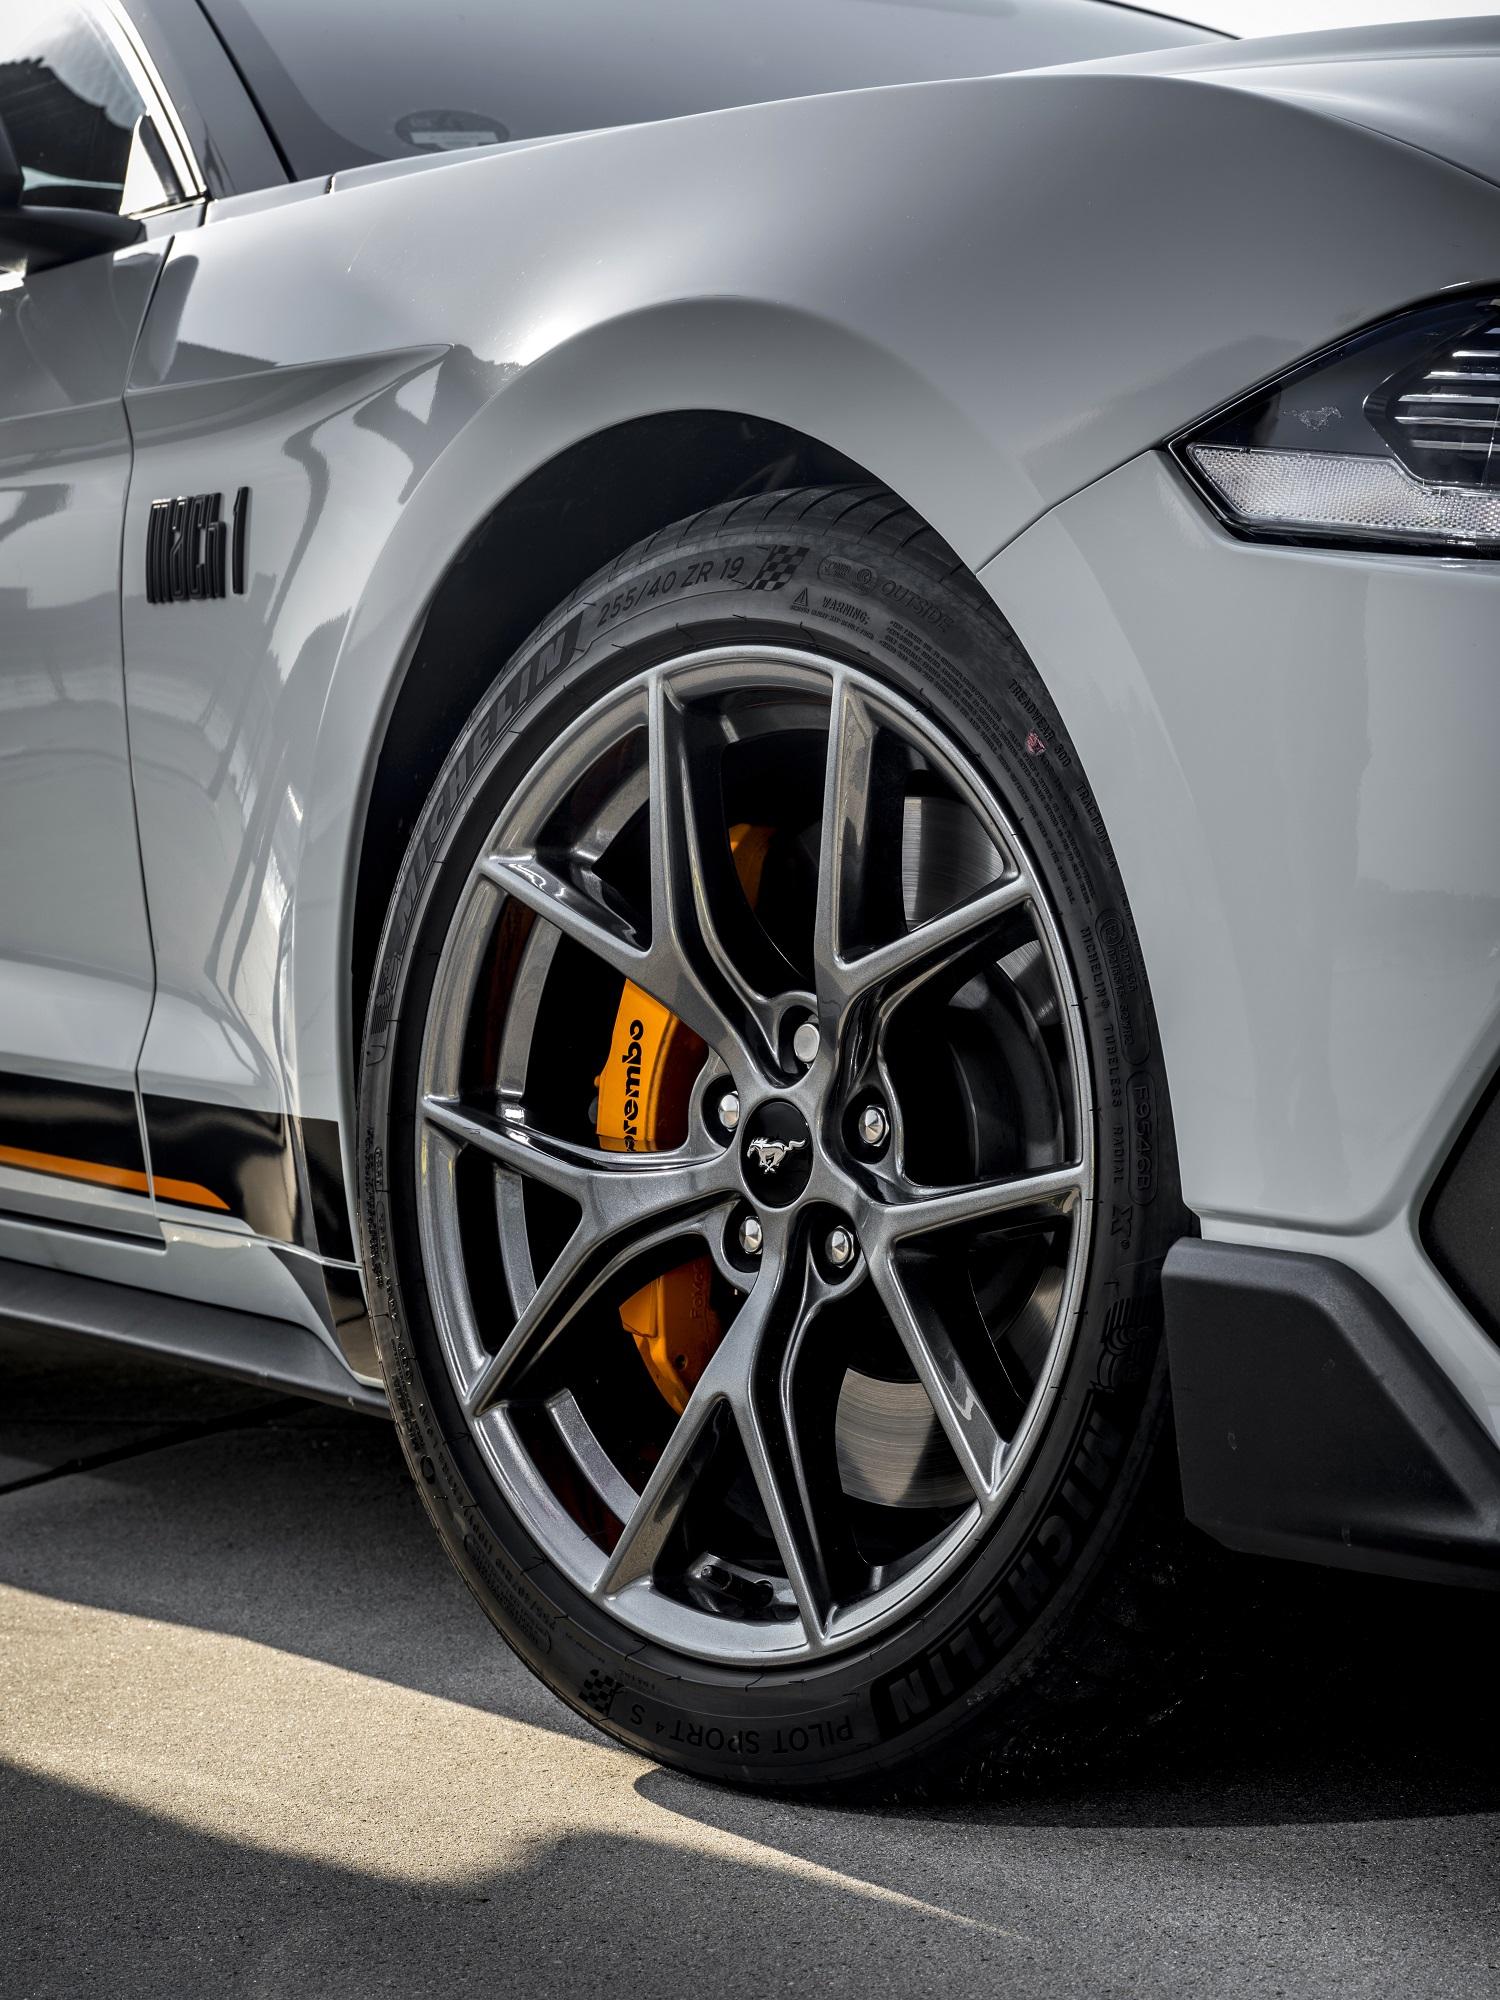 Ford Mustang Mach 1 2021 detalhe roda